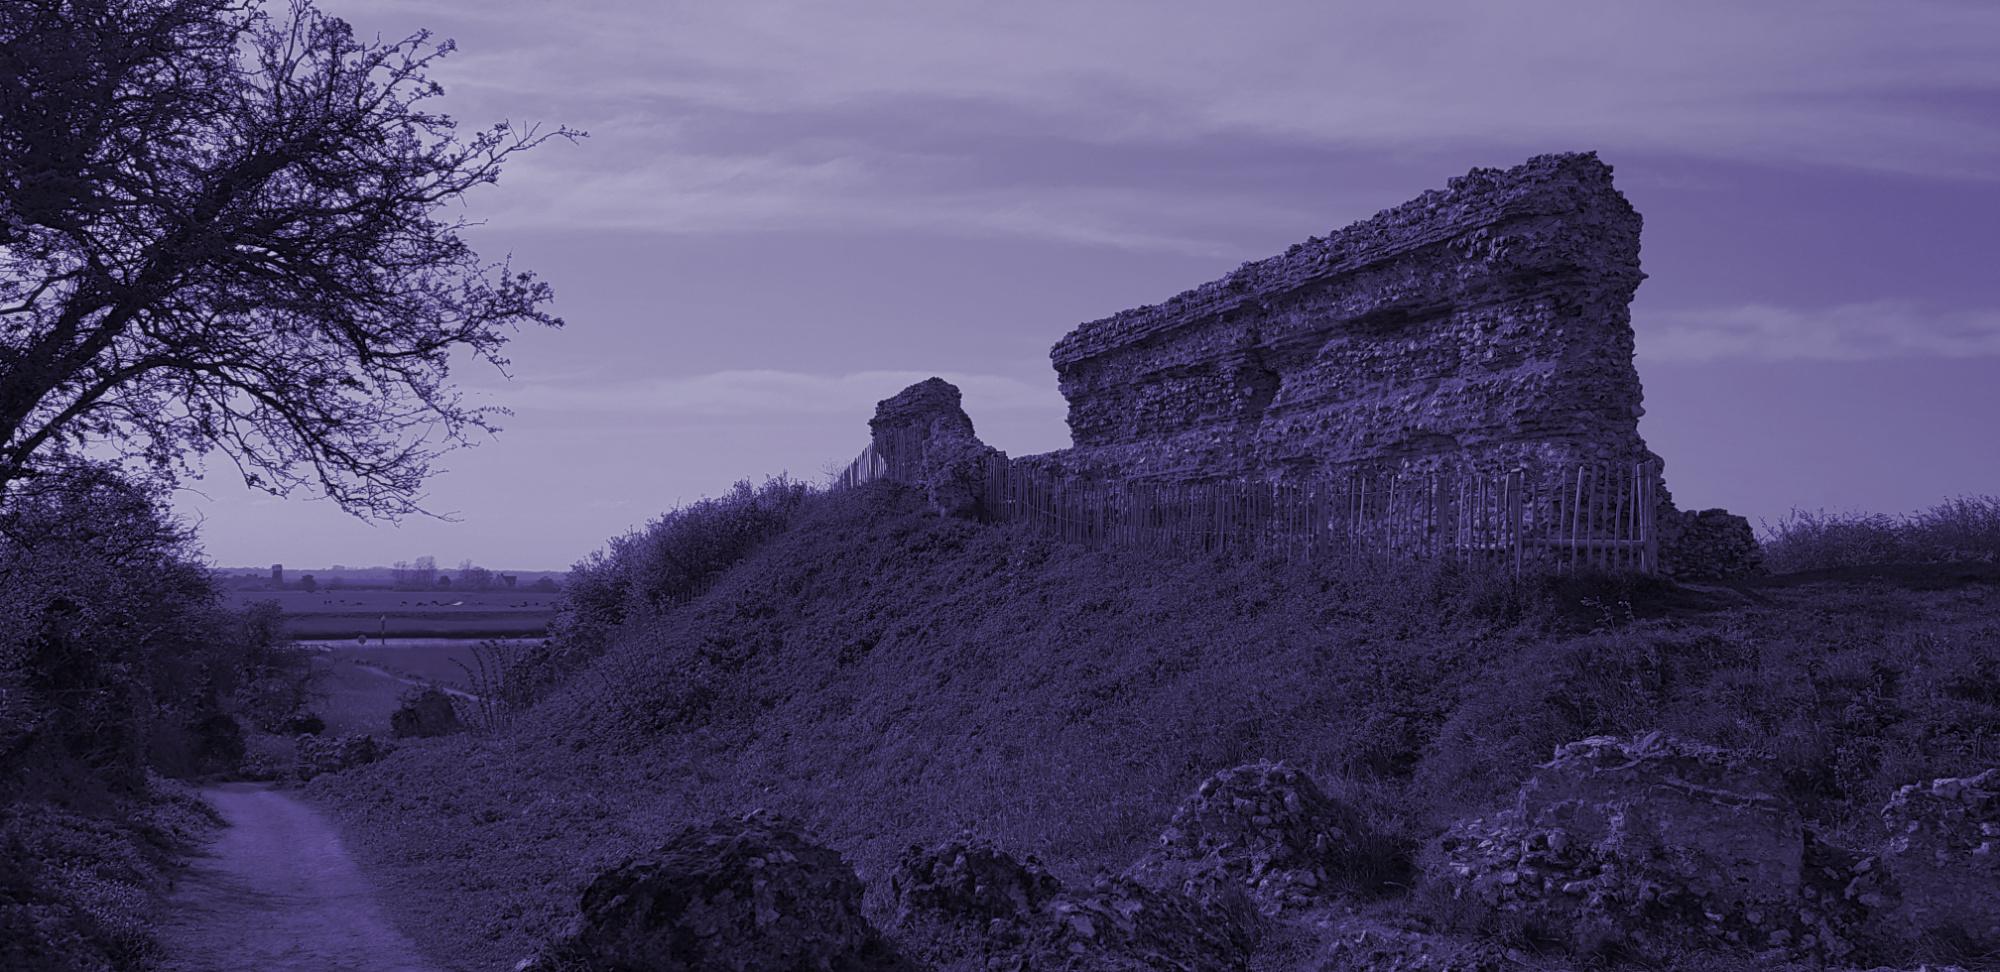 Episode 55 – Burgh Castle